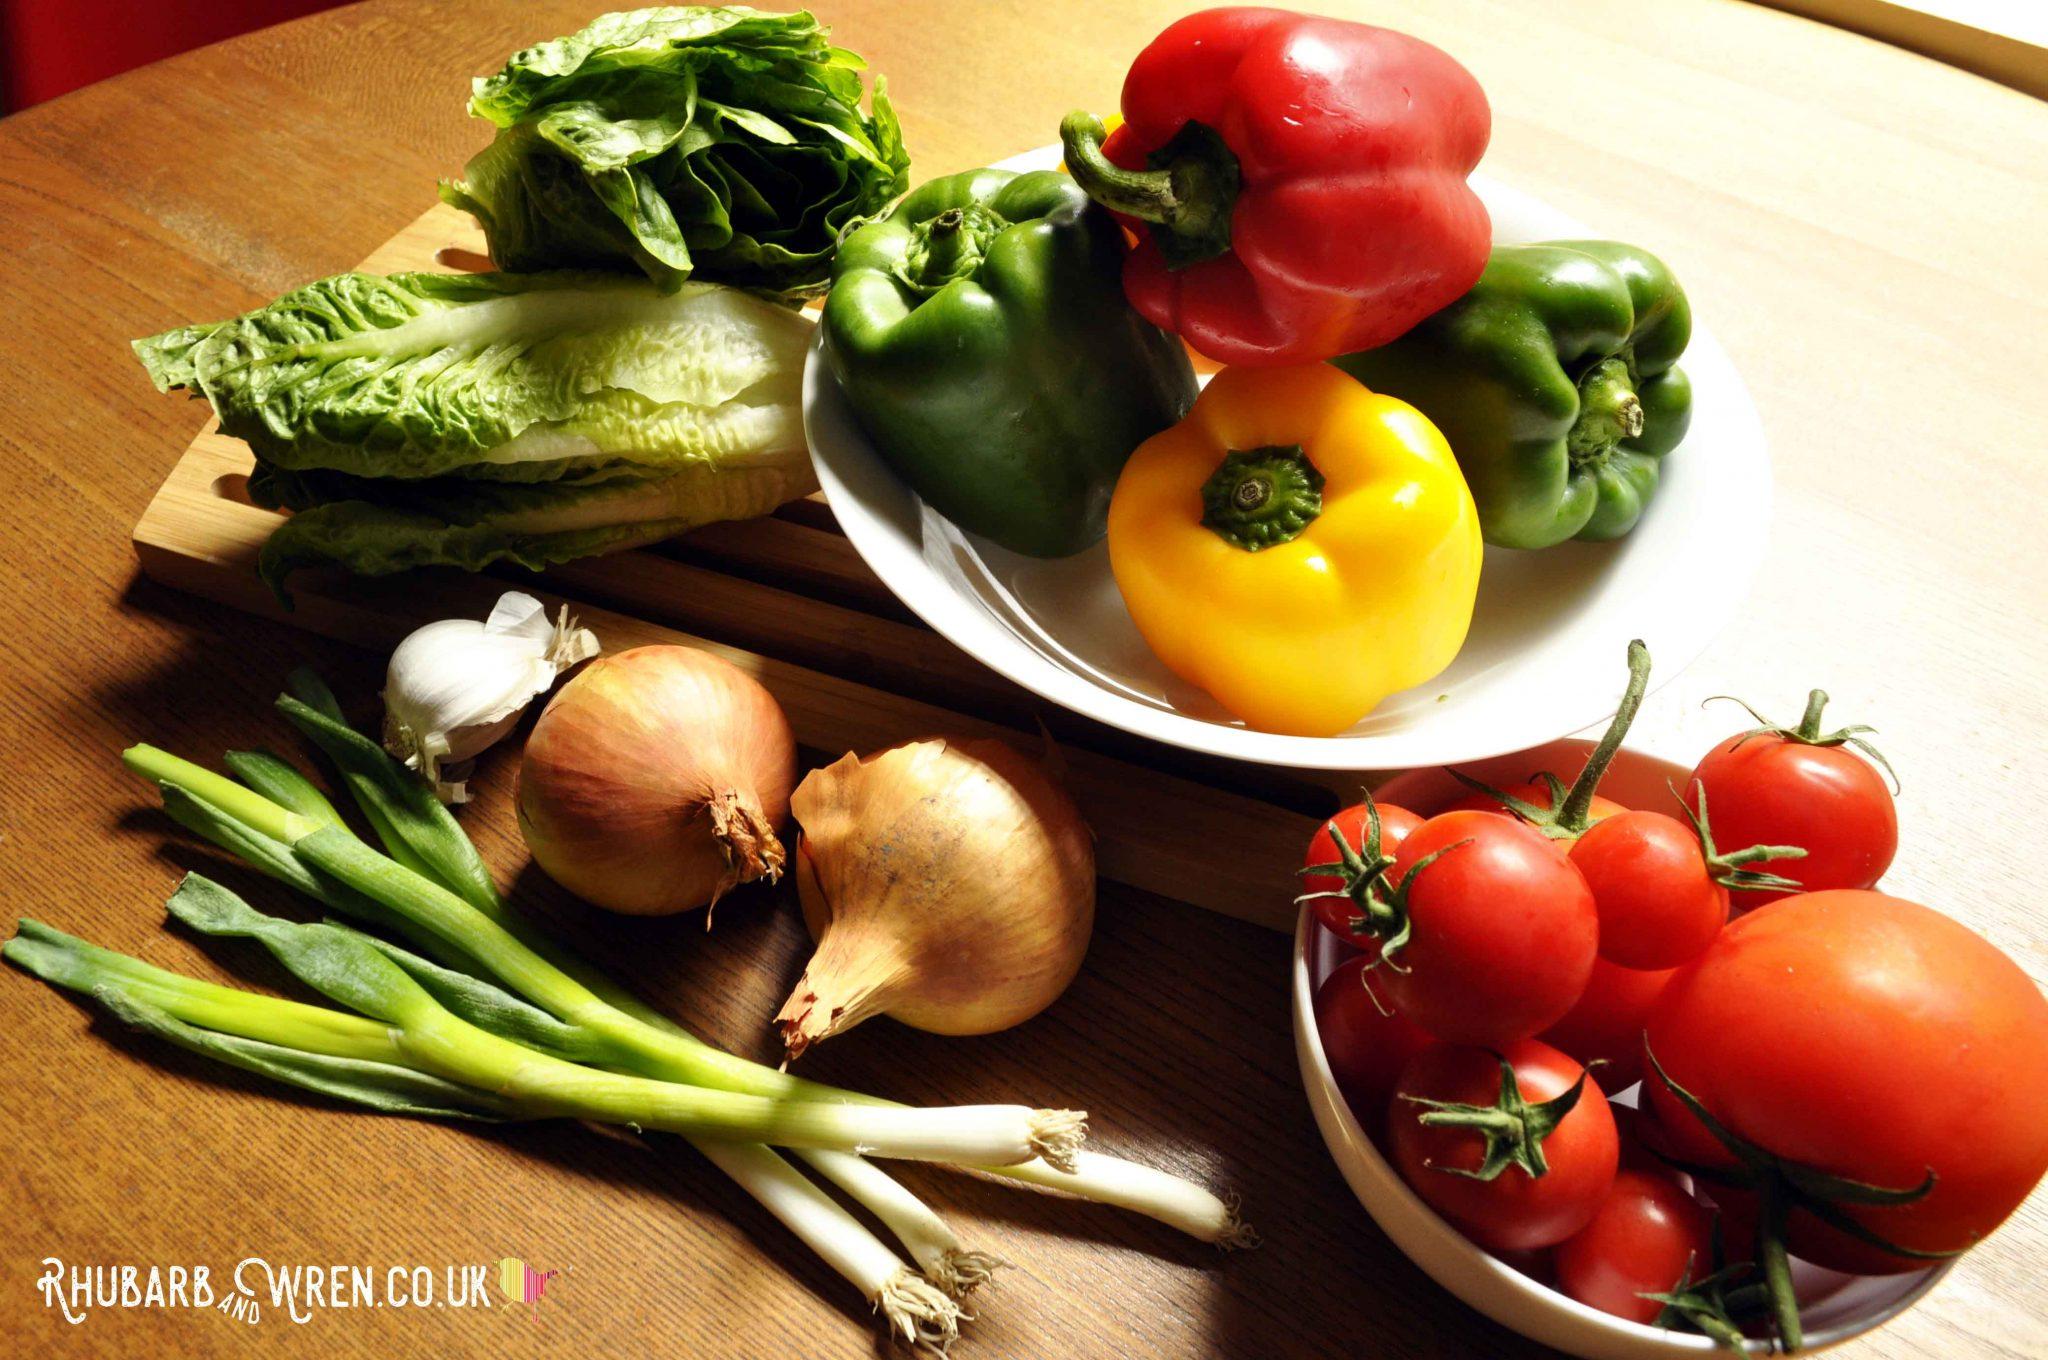 Fresh vegetables for a vegan chili recipe